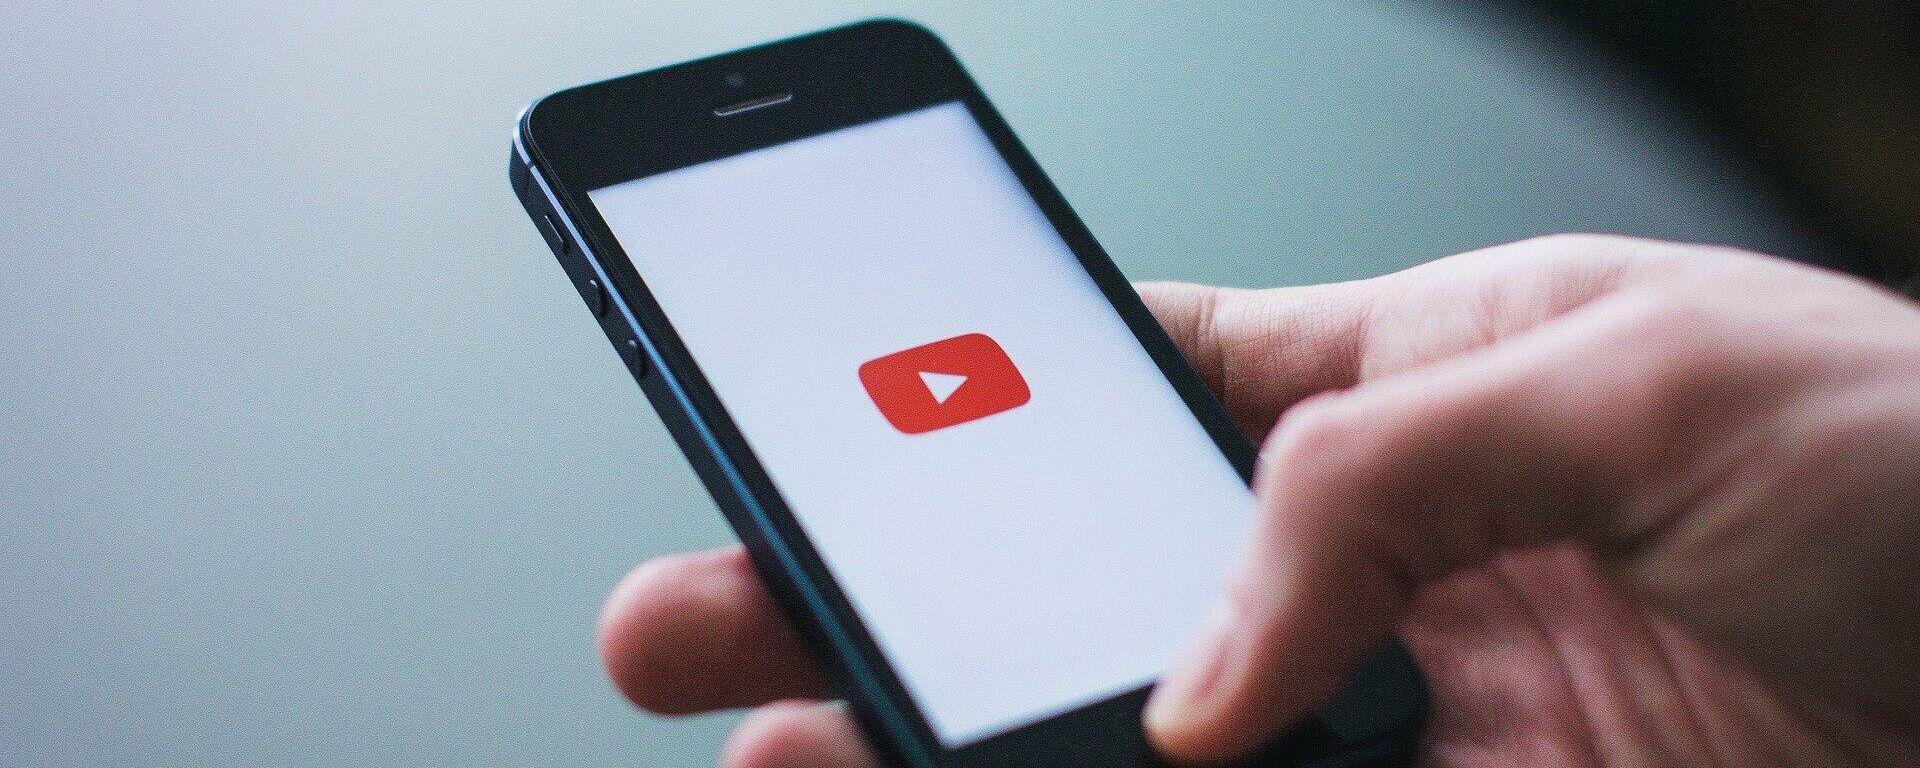 YouTube (Symbolbild) - SNA, 1920, 09.12.2020